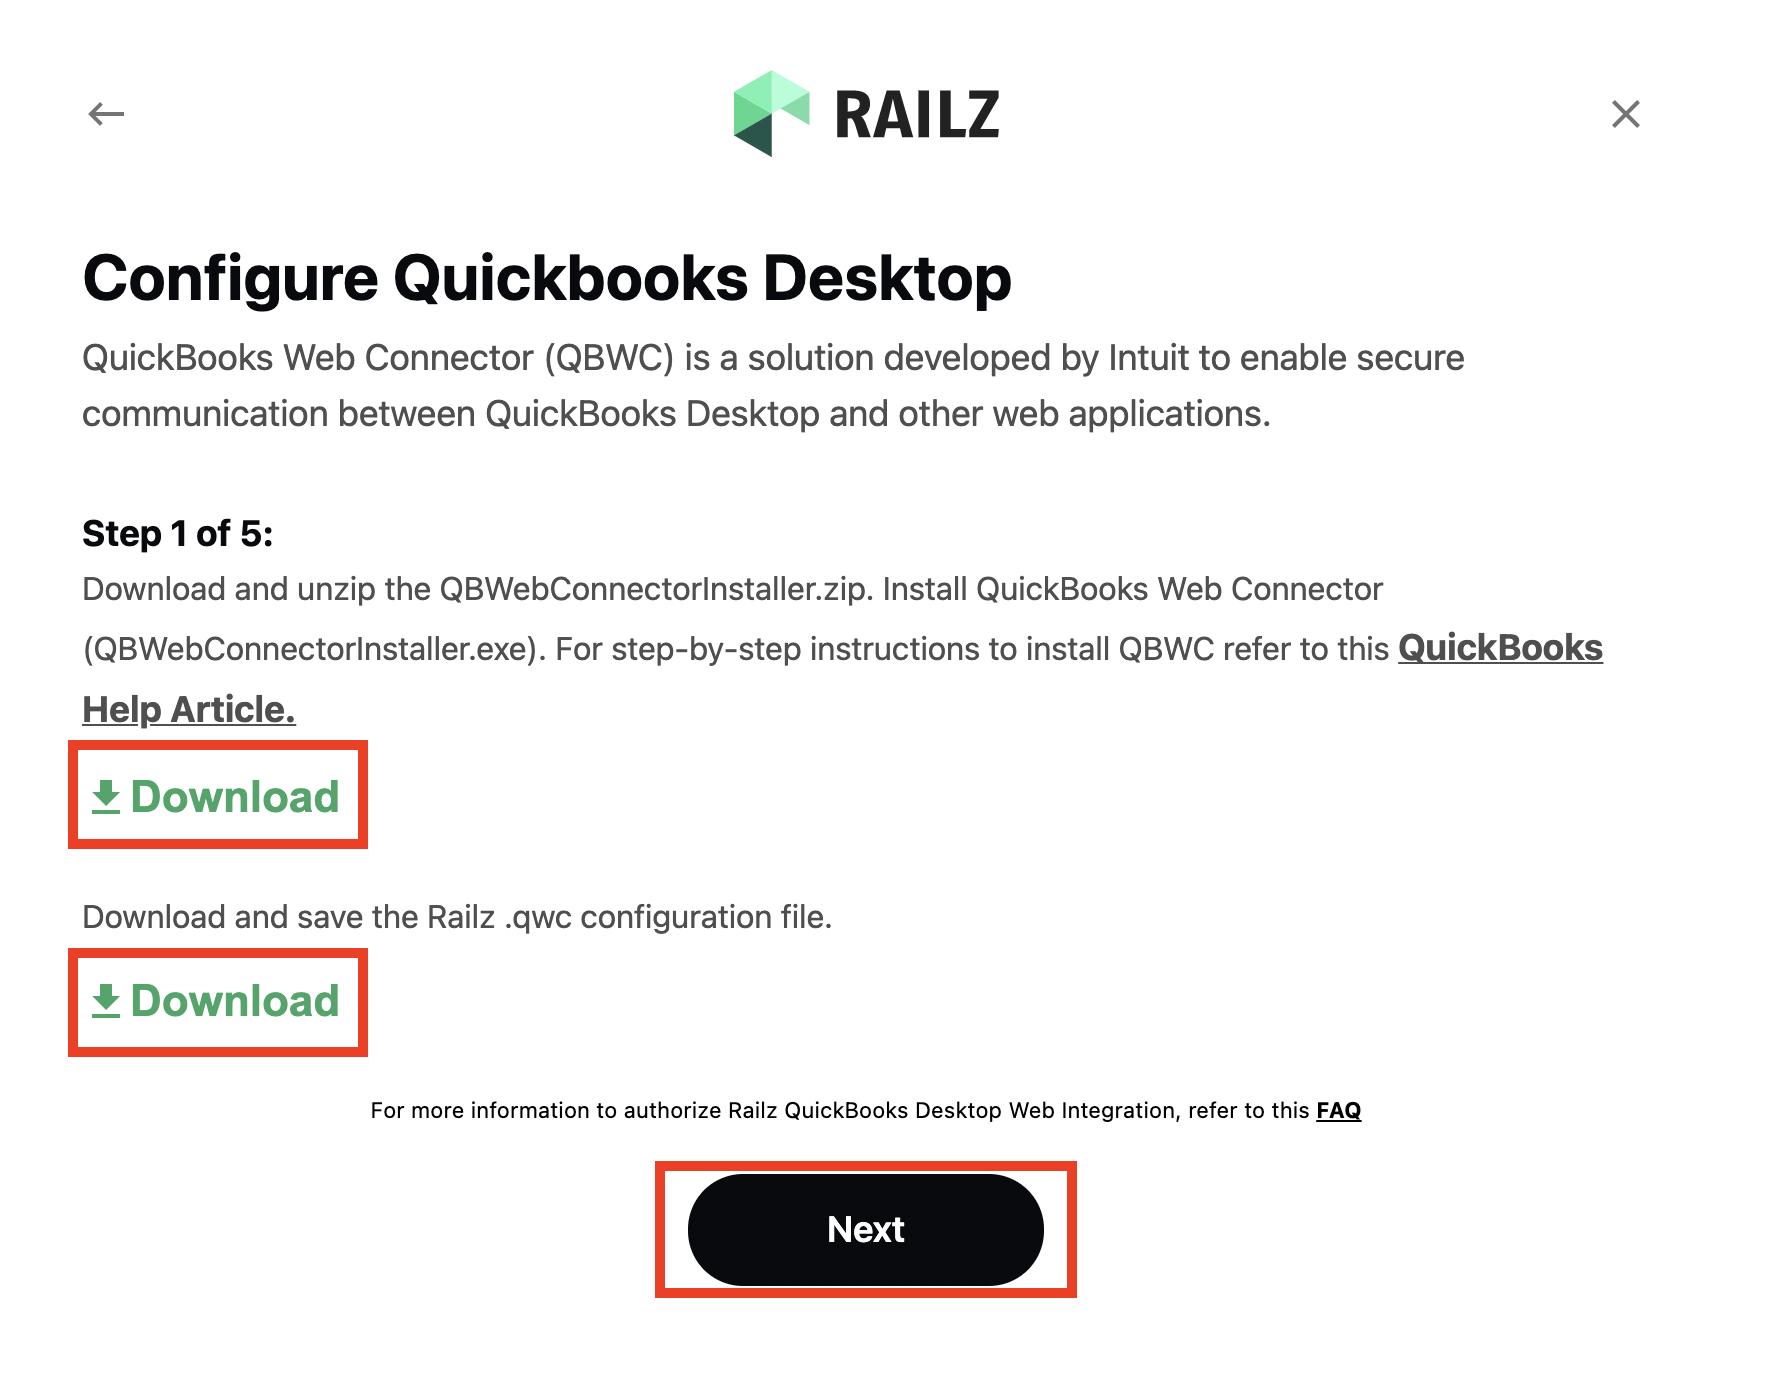 Railz Connect - QuickBooks Desktop Step 1. Click to Expand.